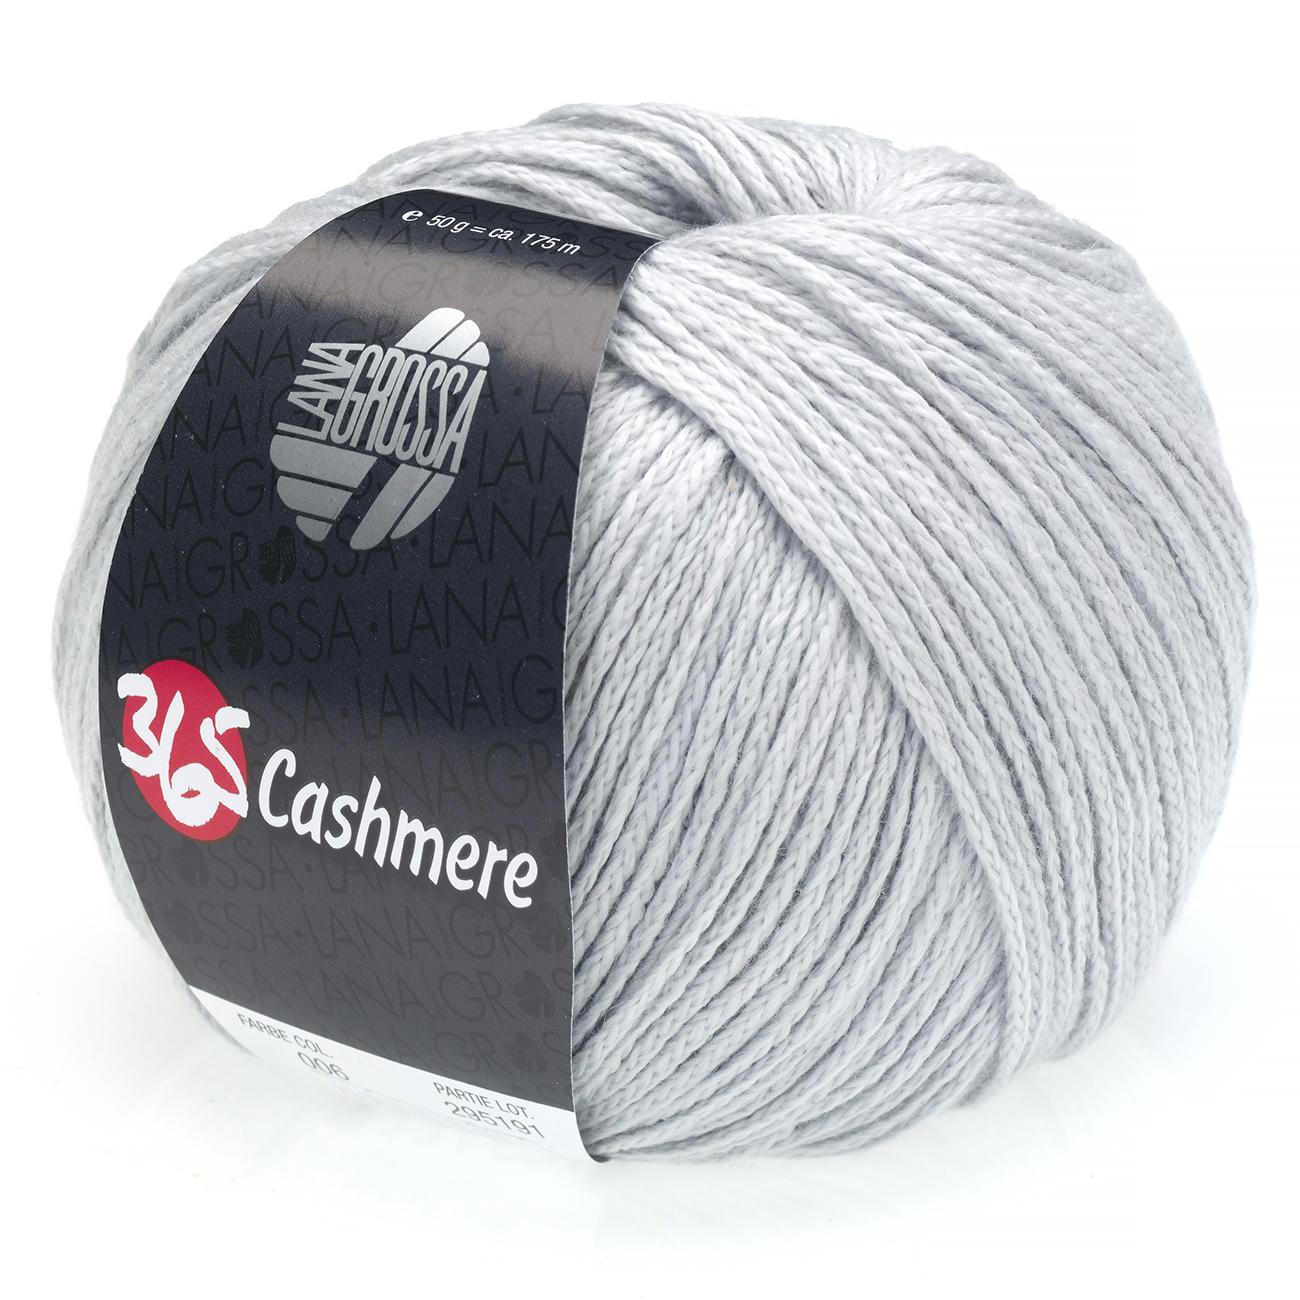 50g Wolle Lana Grossa 365 Cashmere 016 13.90 EUR pro 100 g